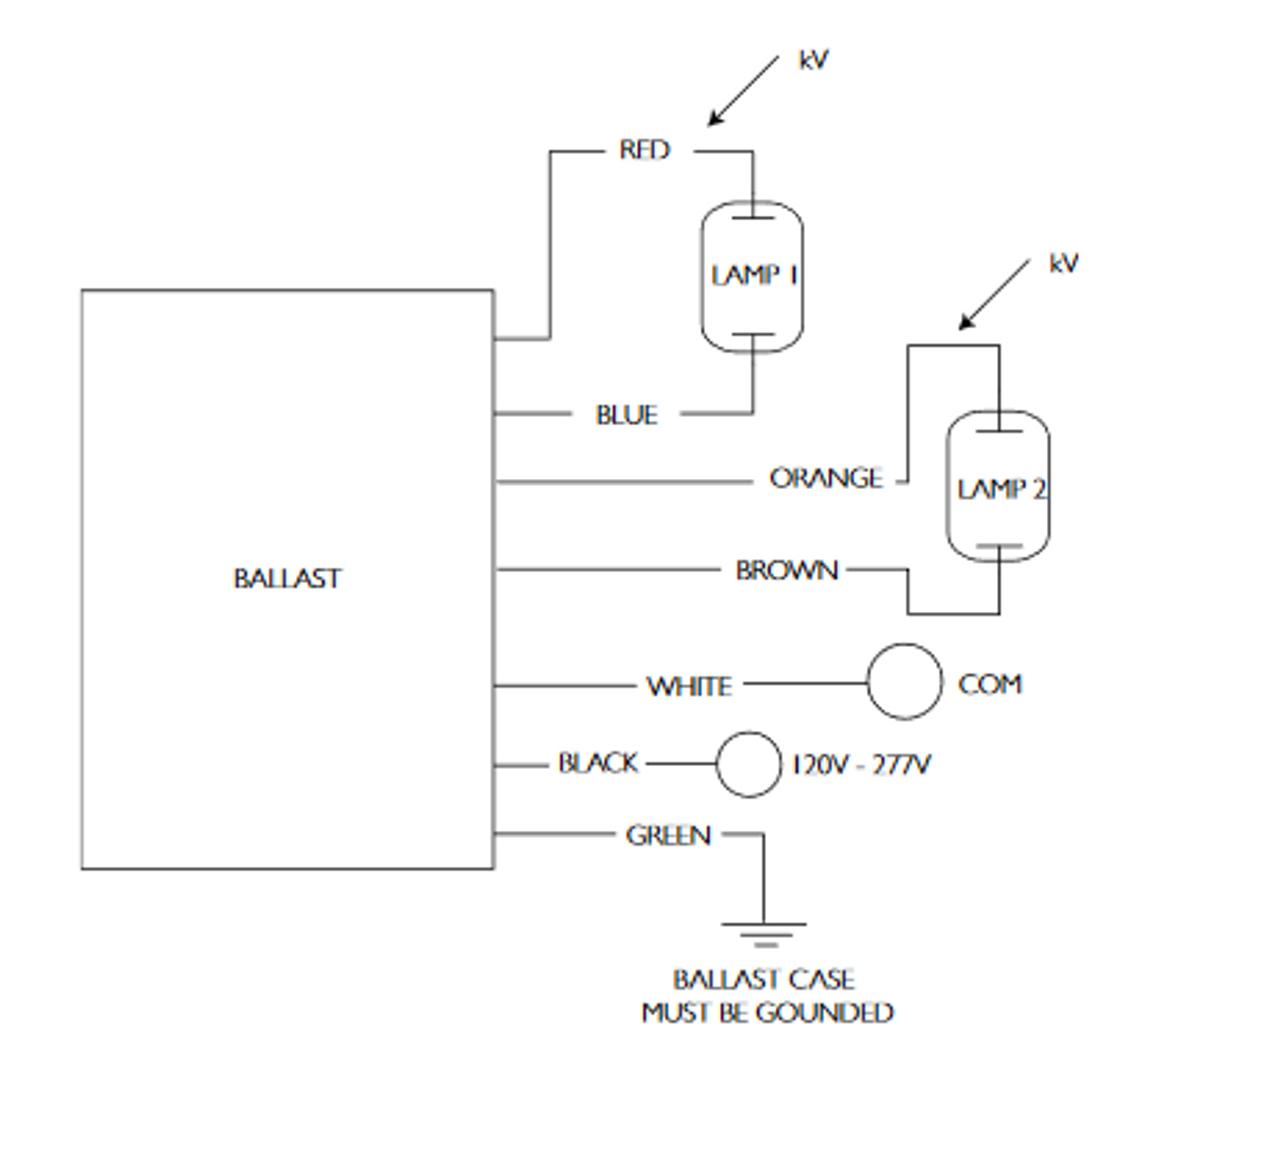 240v ballast wiring diagram | wiring diagram technic on hps ballast  wiring diagram, bodine emergency